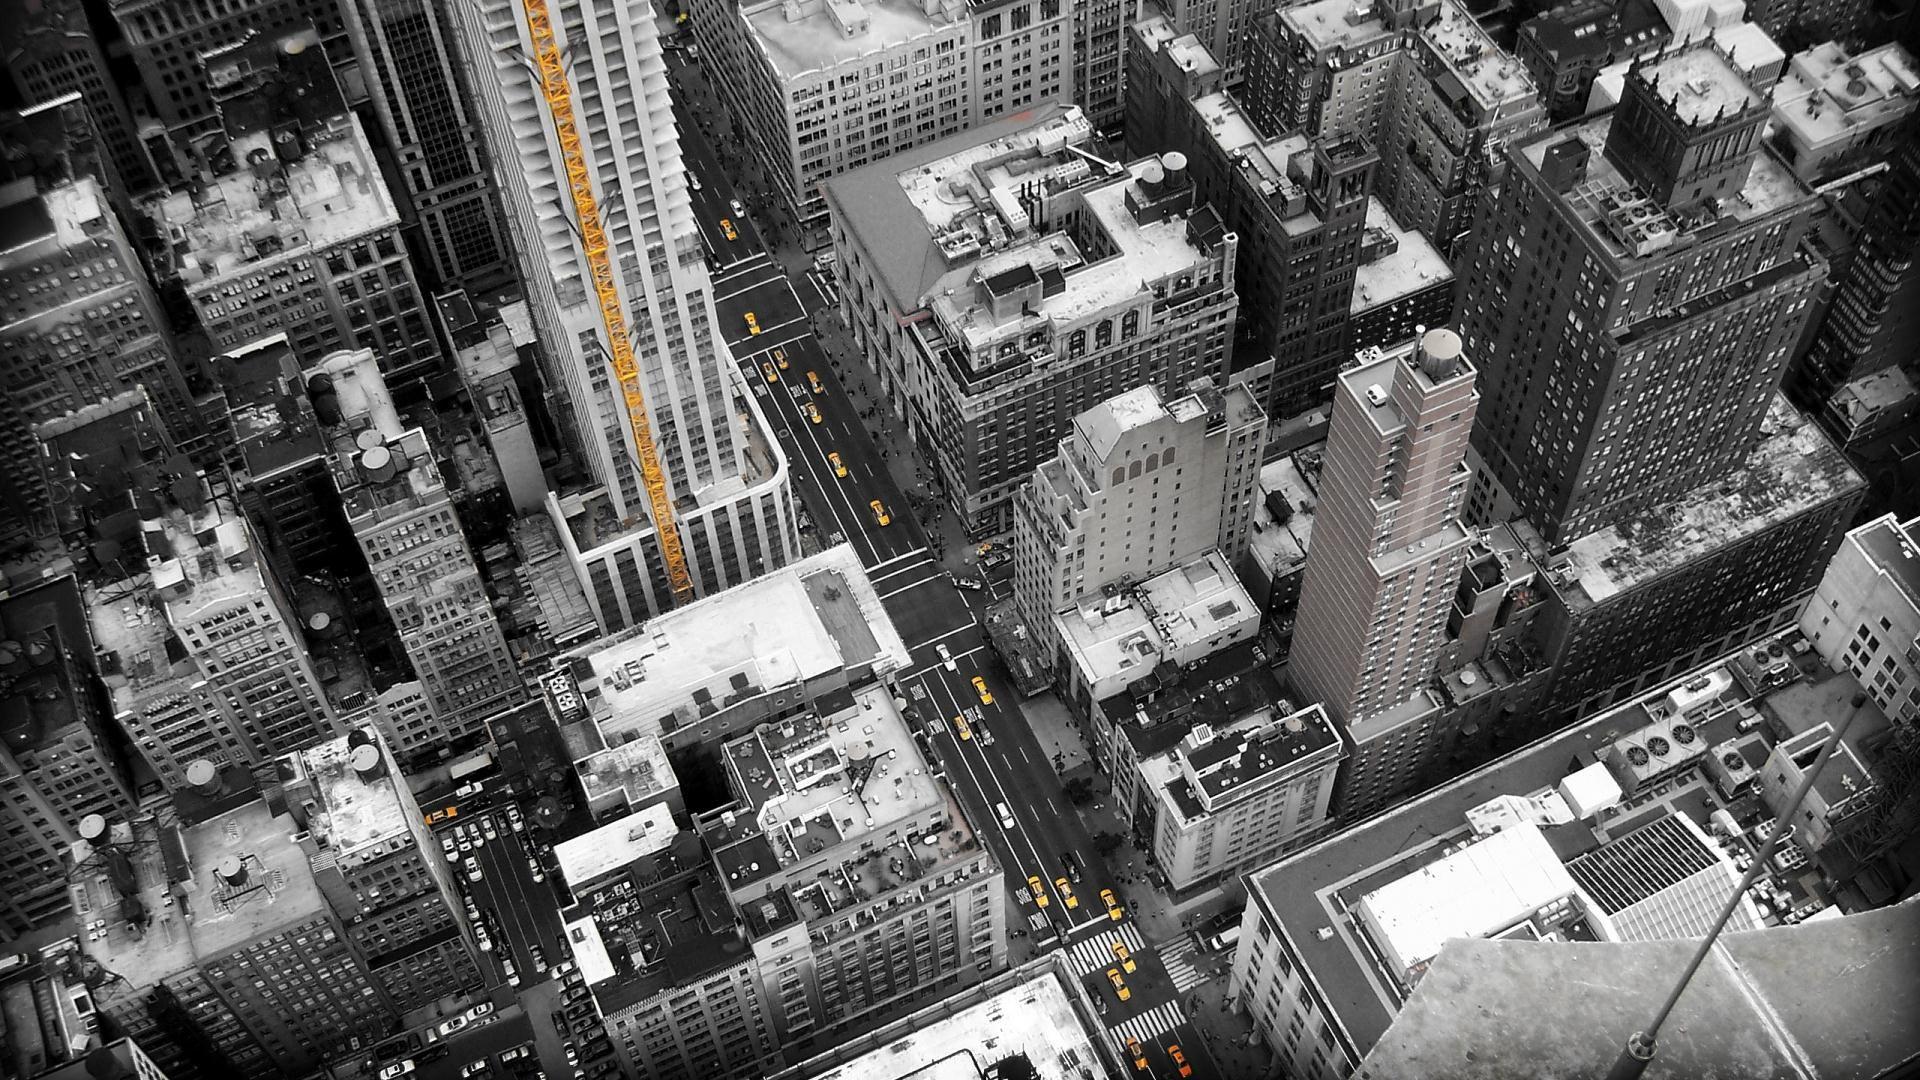 Latest New York City Hd Wallpaper Free Download Hd Free City Streets City Wallpaper City